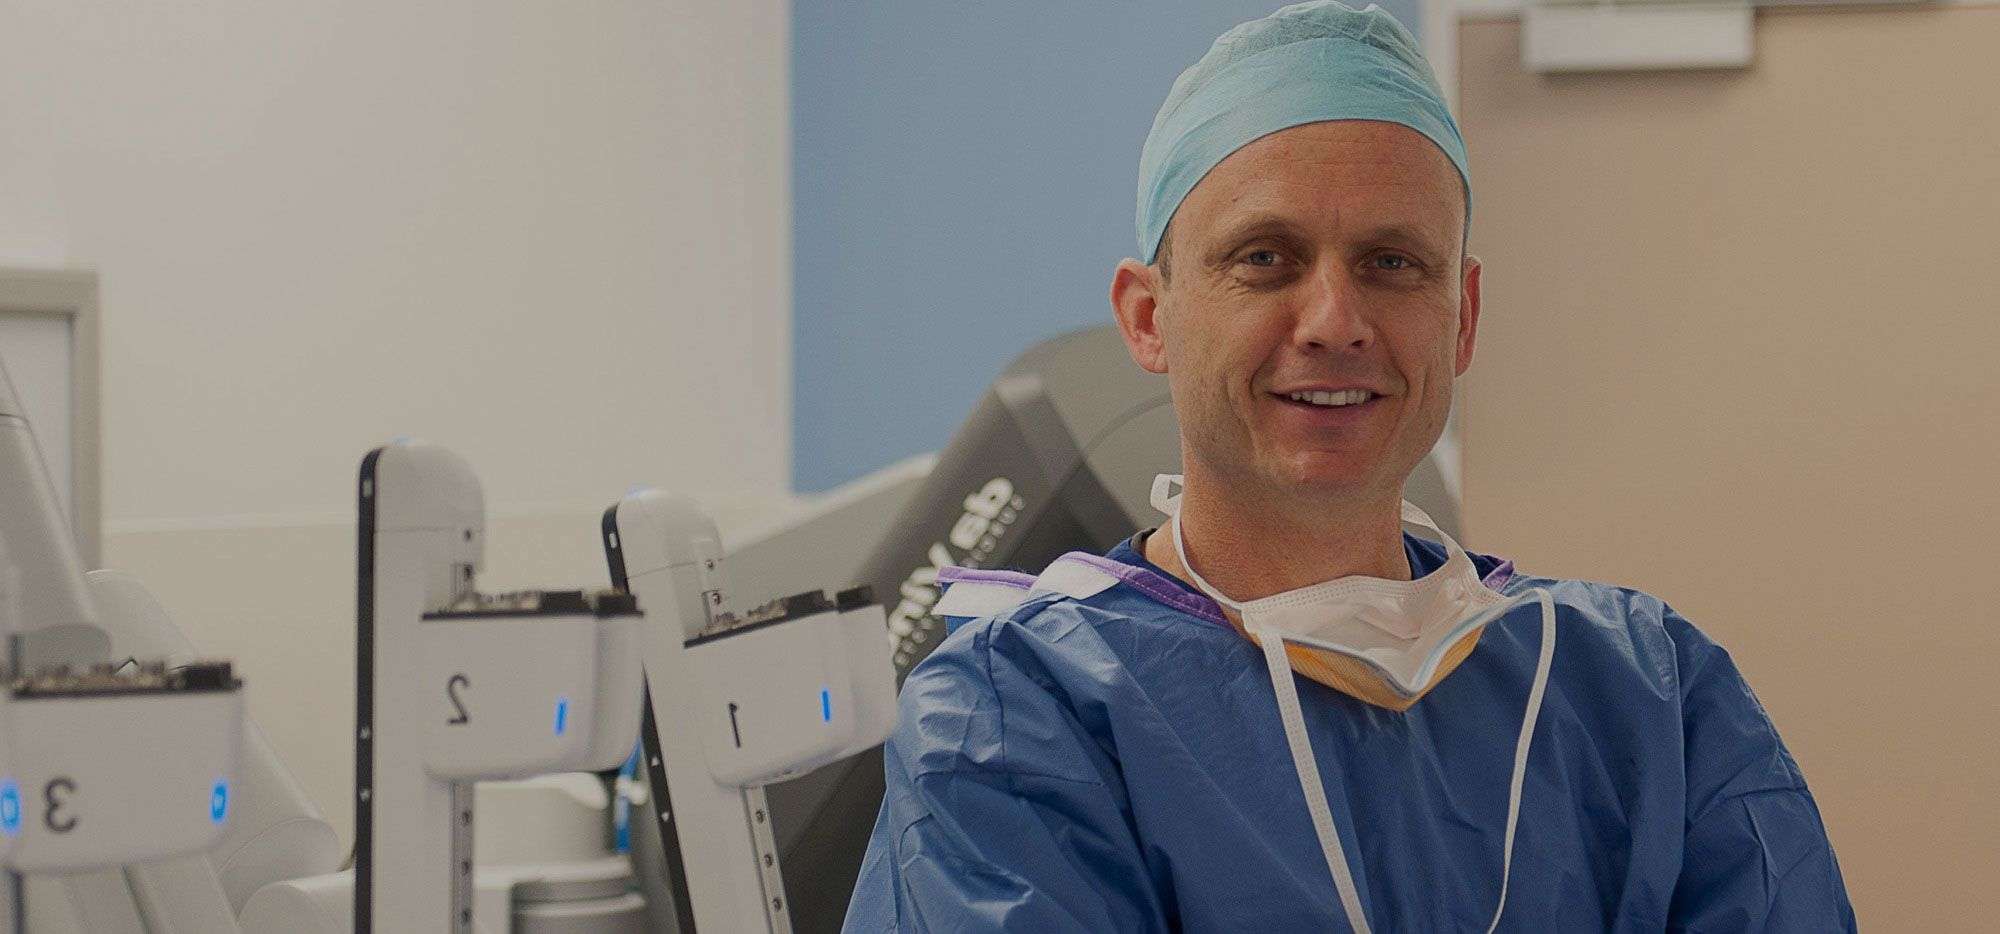 UroLift Enlarged Prostate Treatment Robotic Prostate Surgery Laser Prostate Surgery with The Prostate Clinic in Australia Dr Charles Chabert